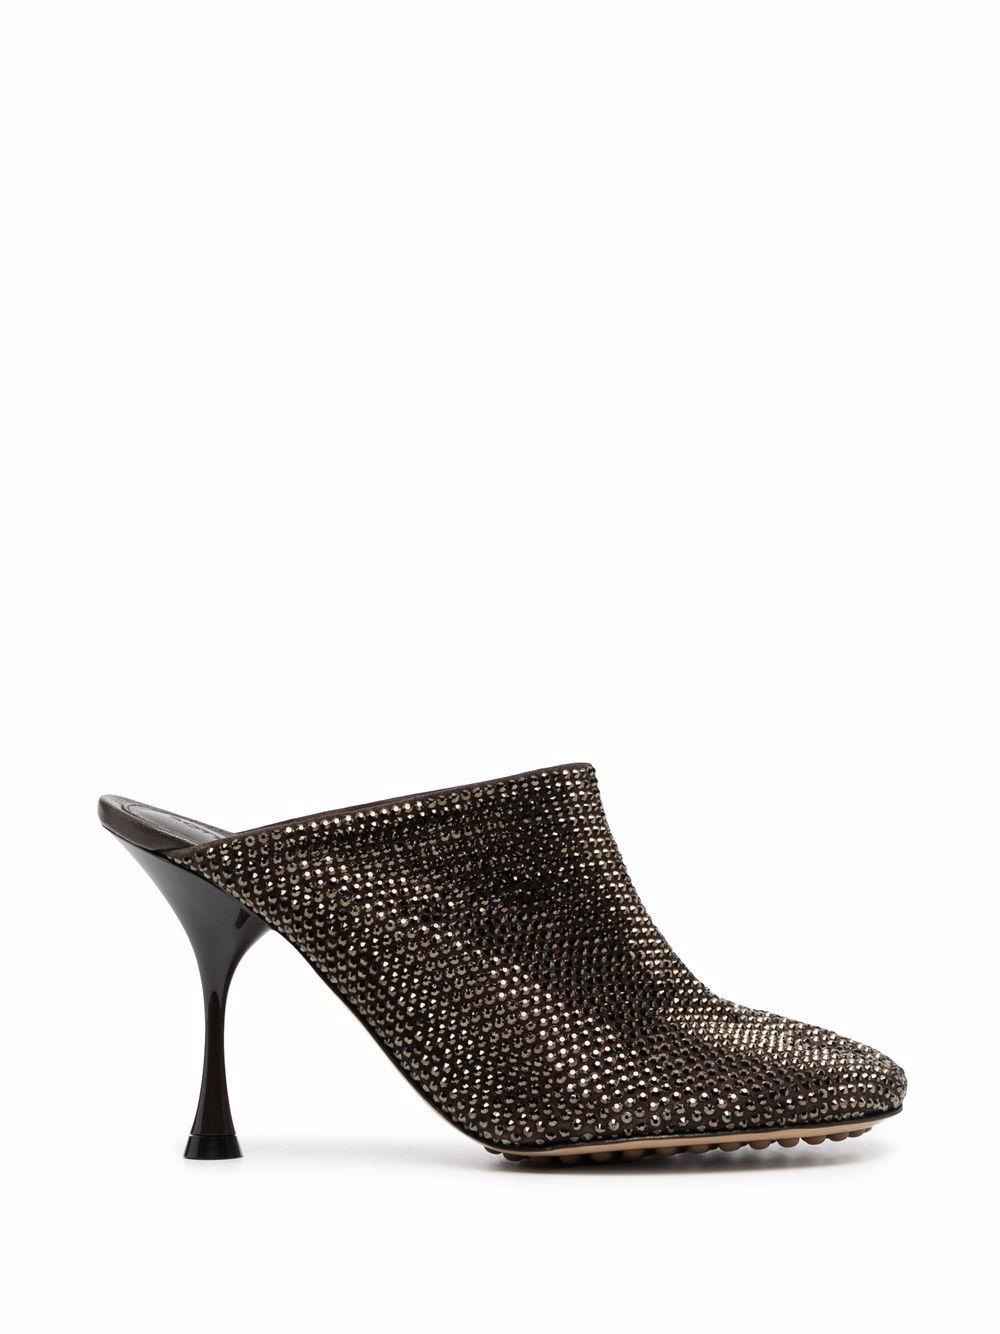 BOTTEGA VENETA- Sparkle Dot Sock Mules- Woman- 39 - Brown